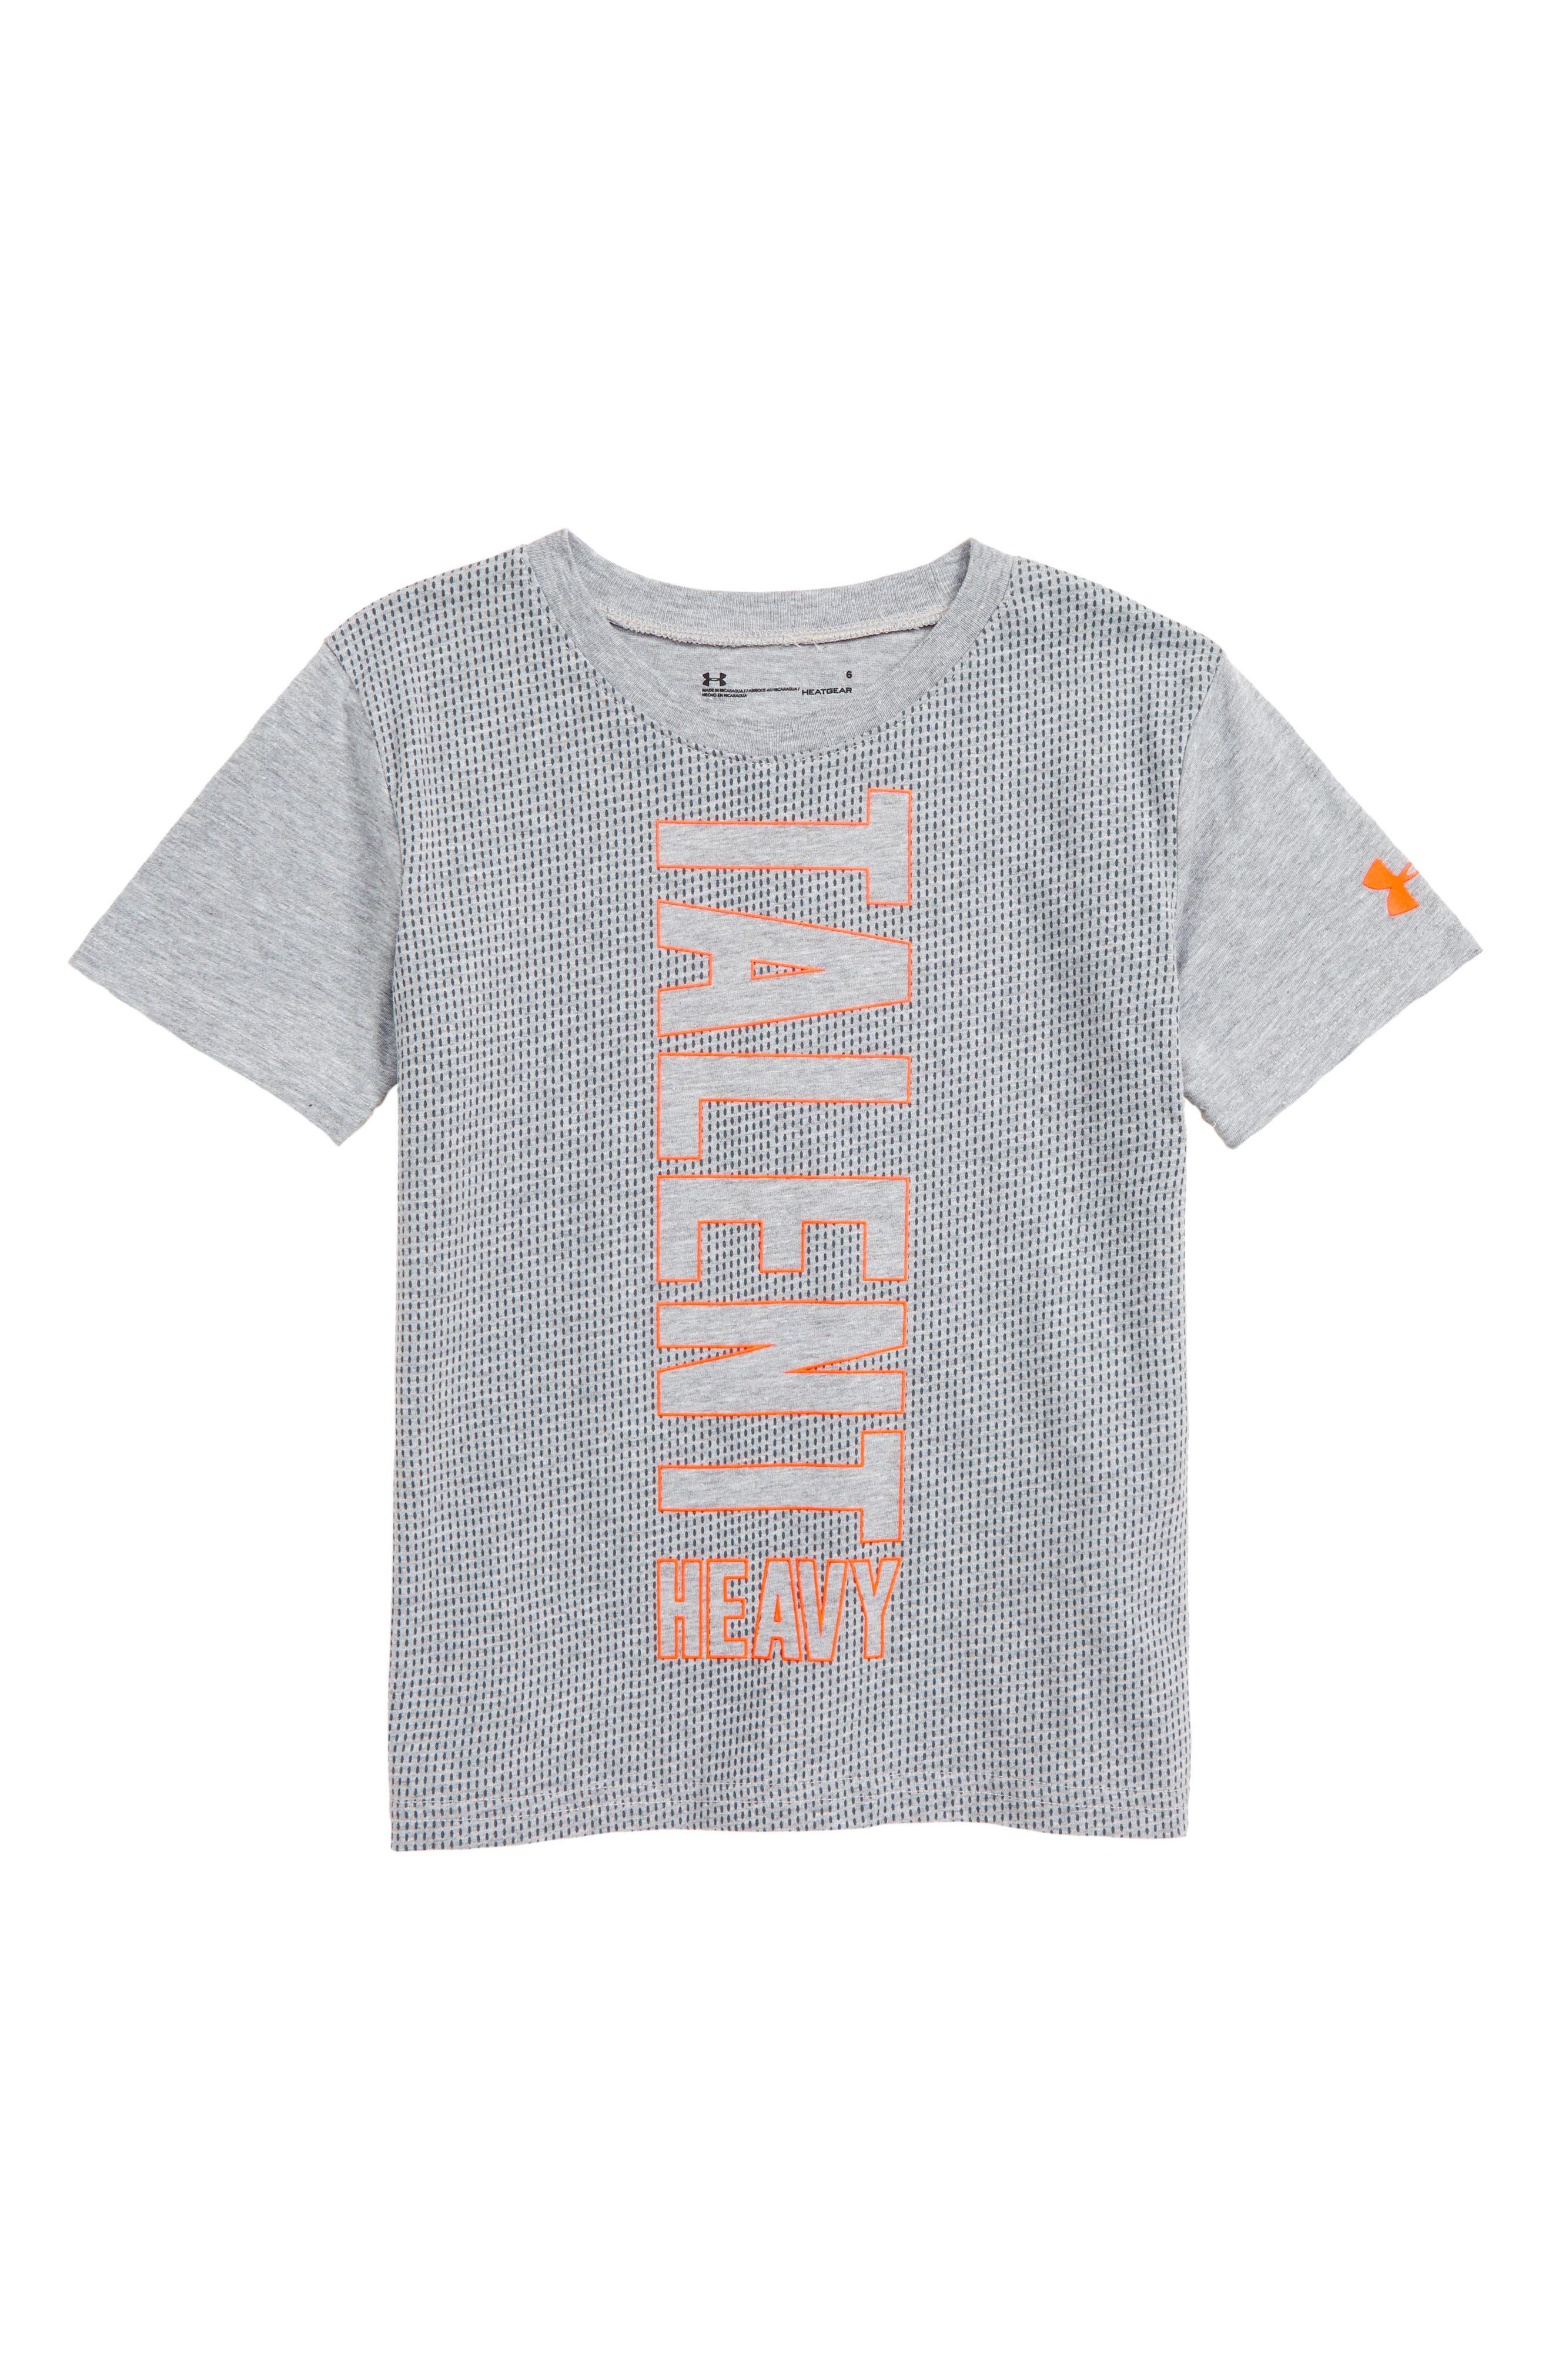 UNDER ARMOUR Talent Heavy Twist HeatGear<sup>®</sup> T-Shirt, Main, color, MOD GRAY